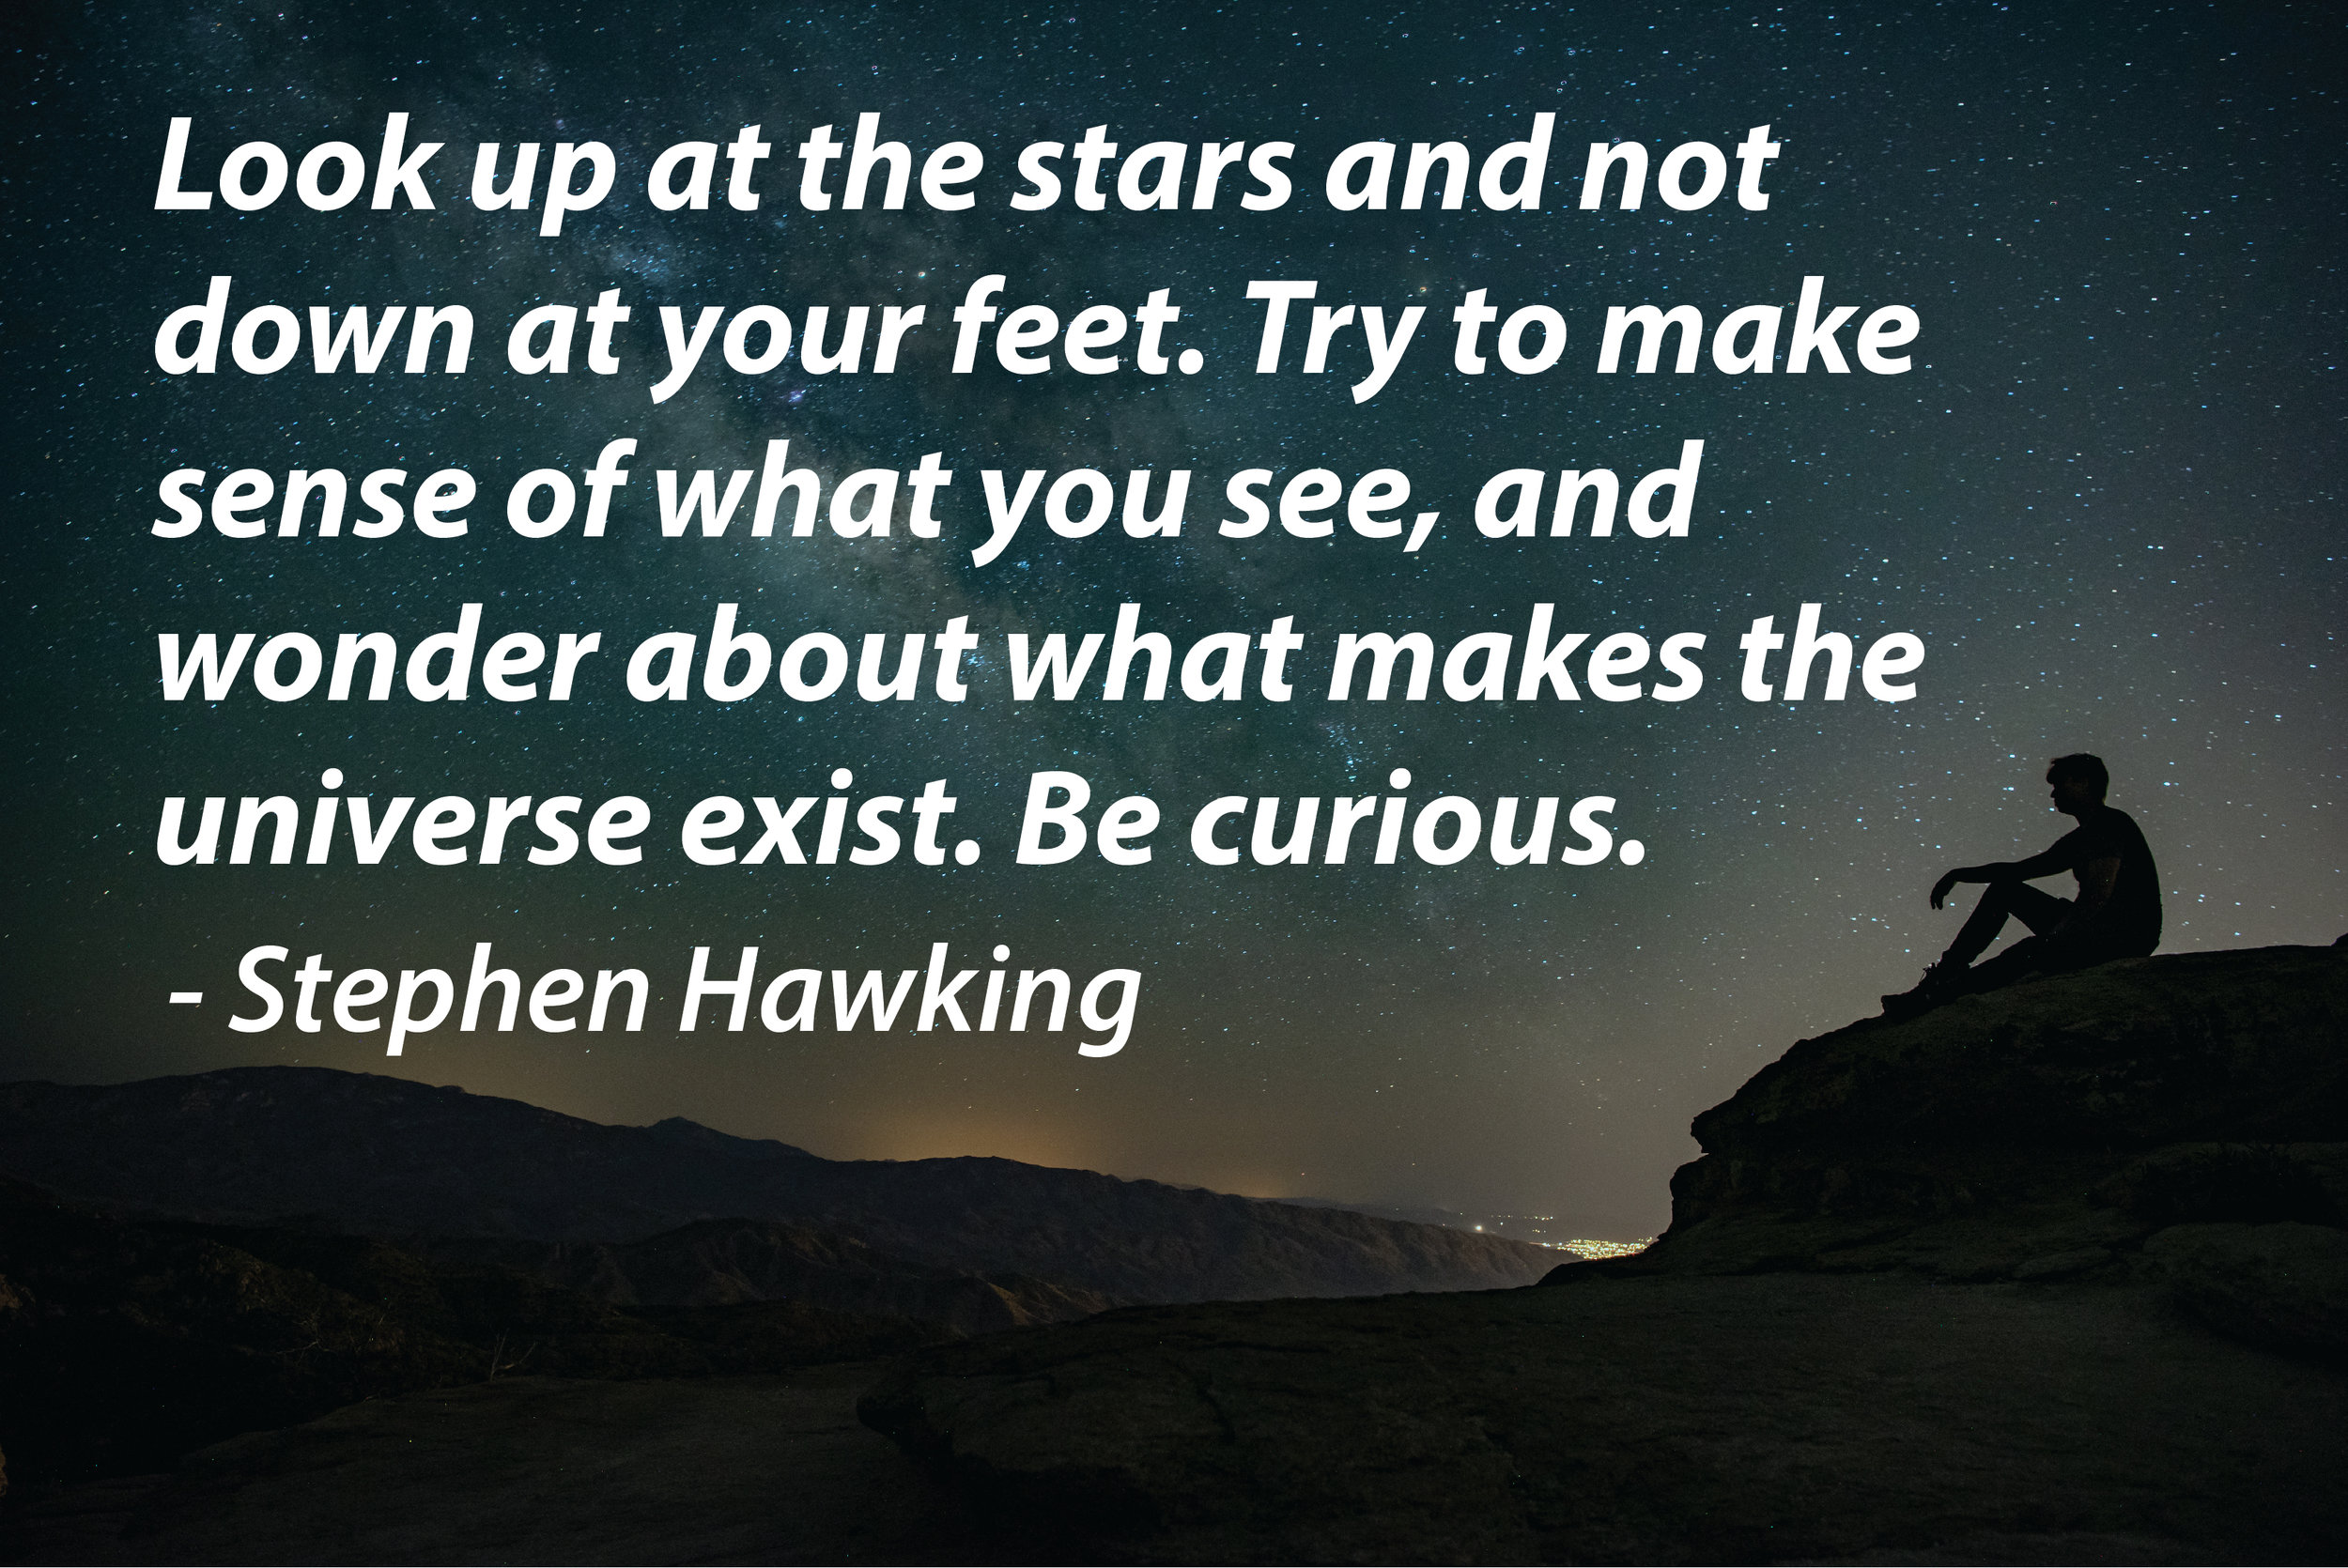 Look up at the stars.jpg